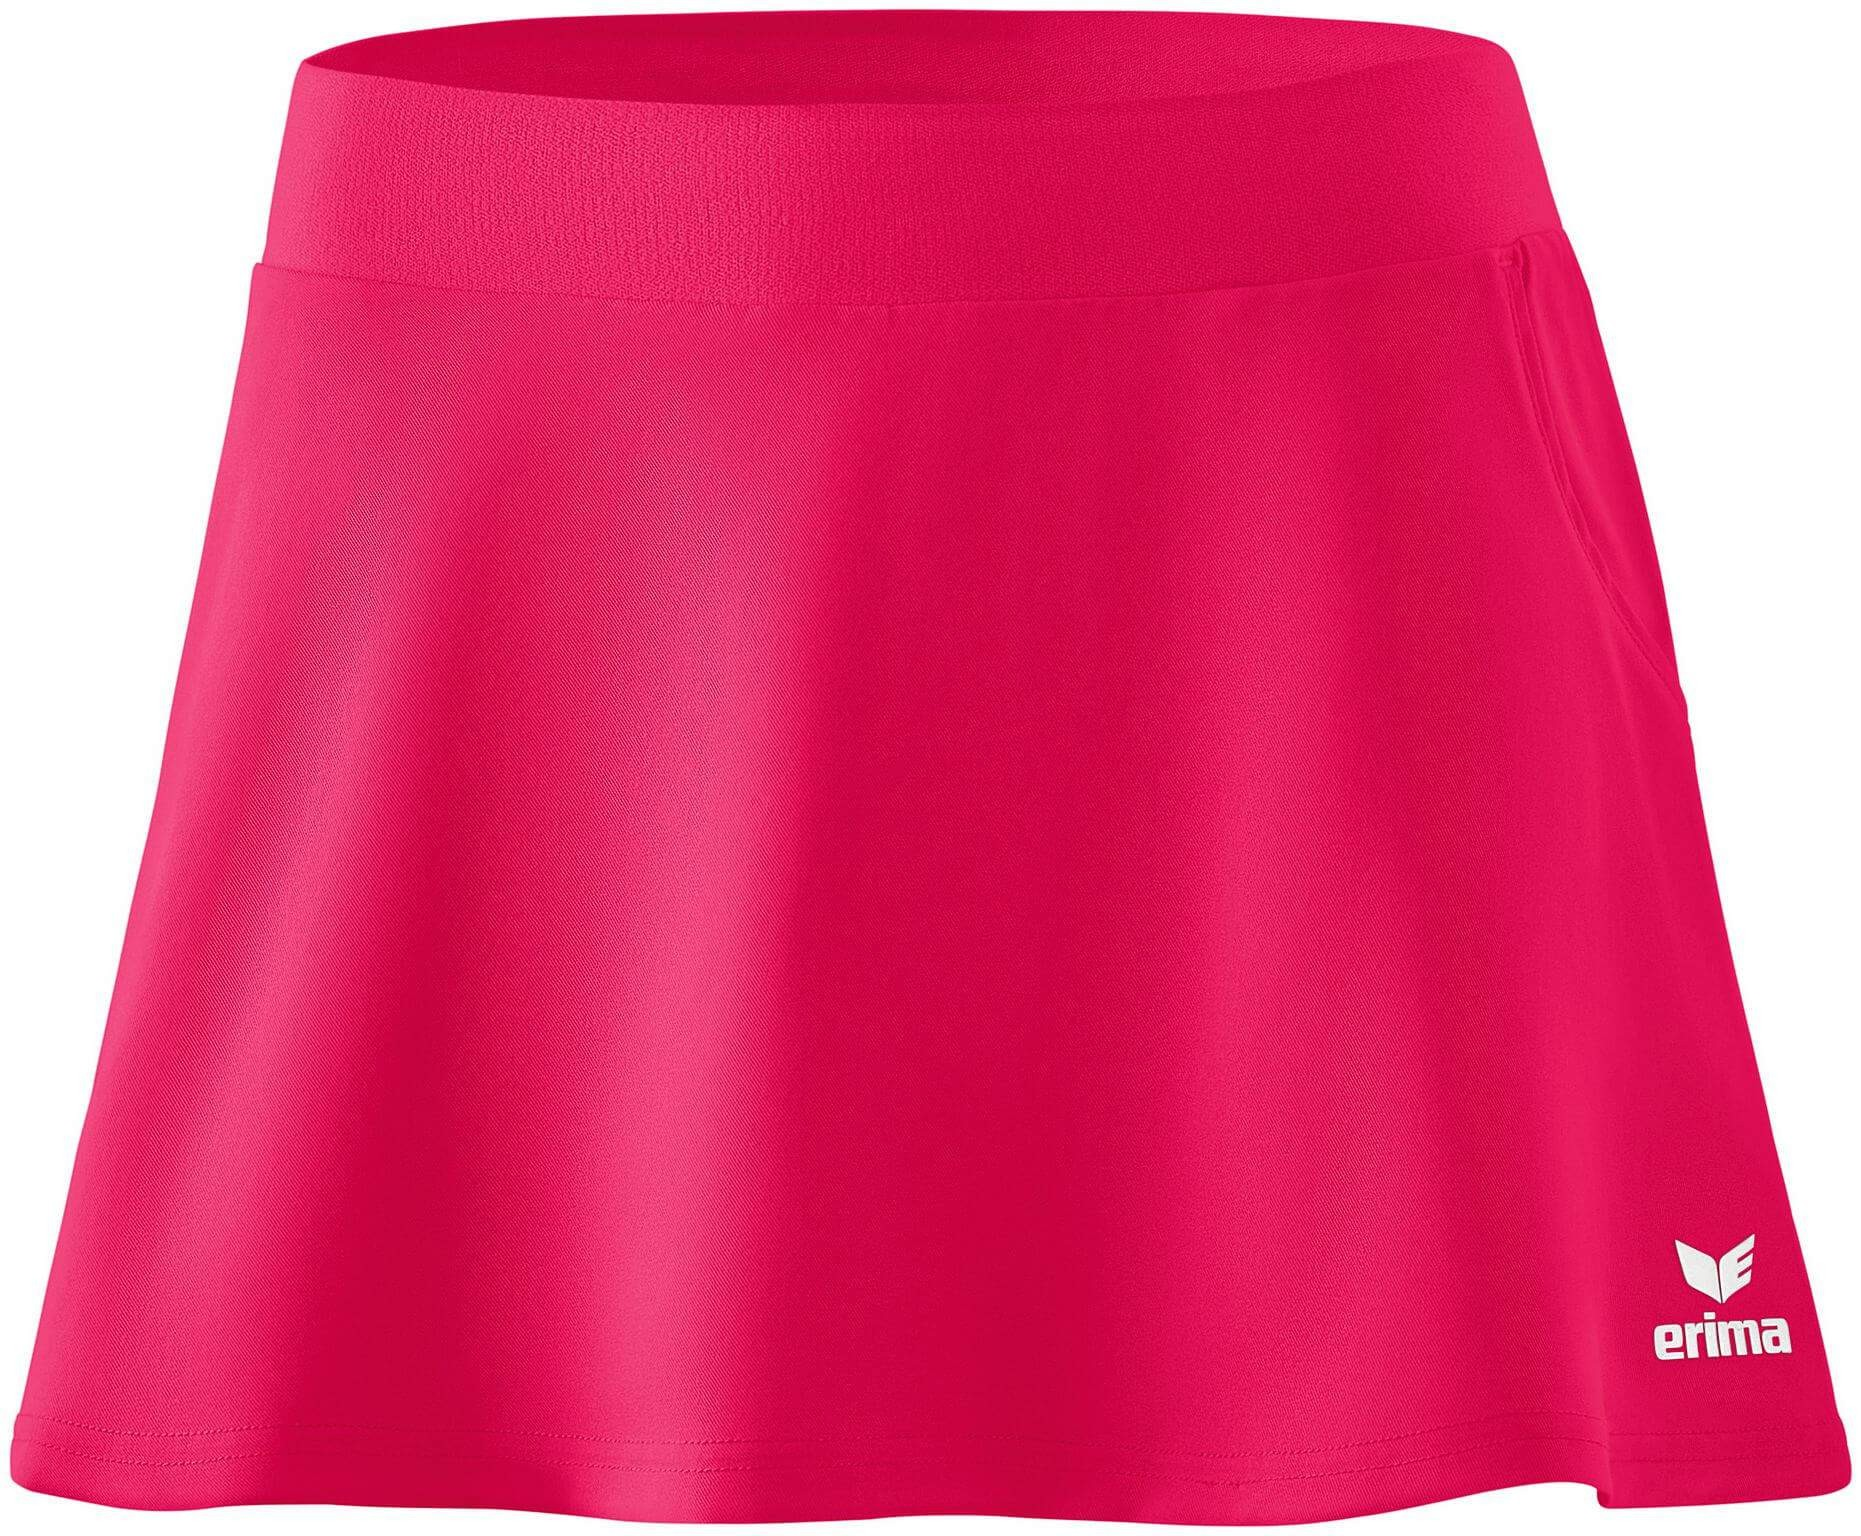 ERIMA ESSENTIAL spódniczka tenisowa damska